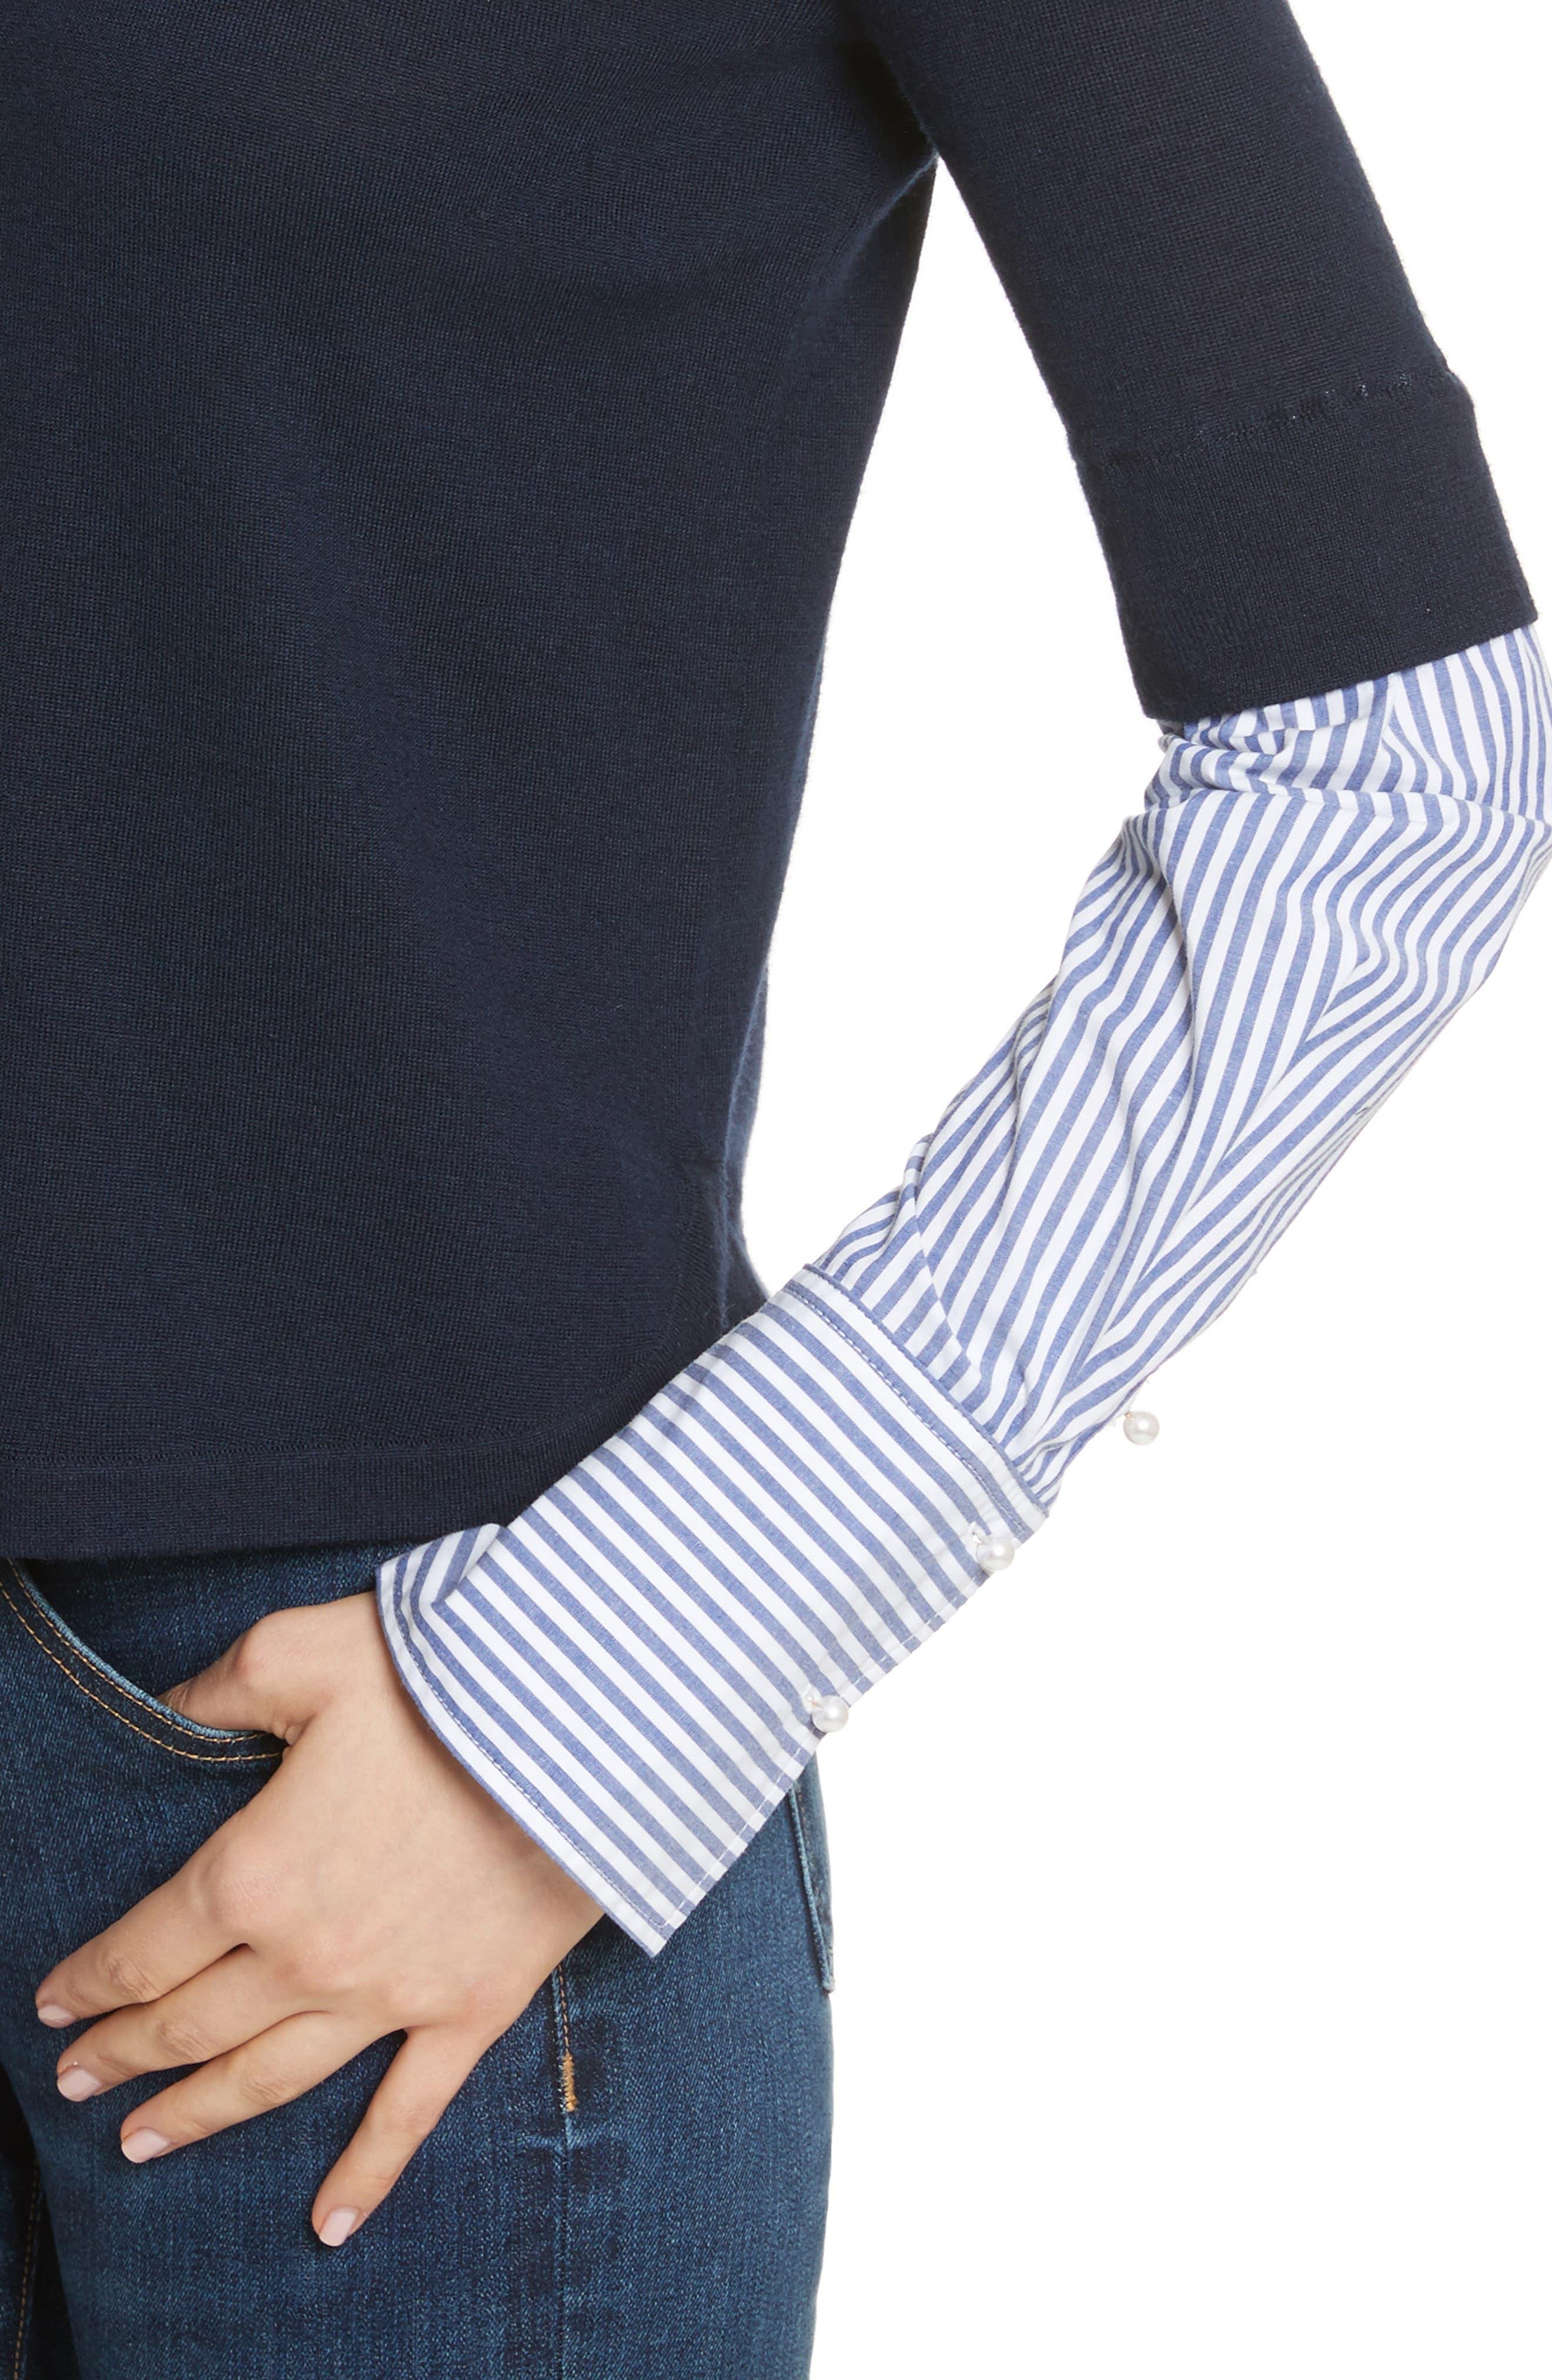 Roscoe Mixed Media Sweater,                             Alternate thumbnail 4, color,                             410